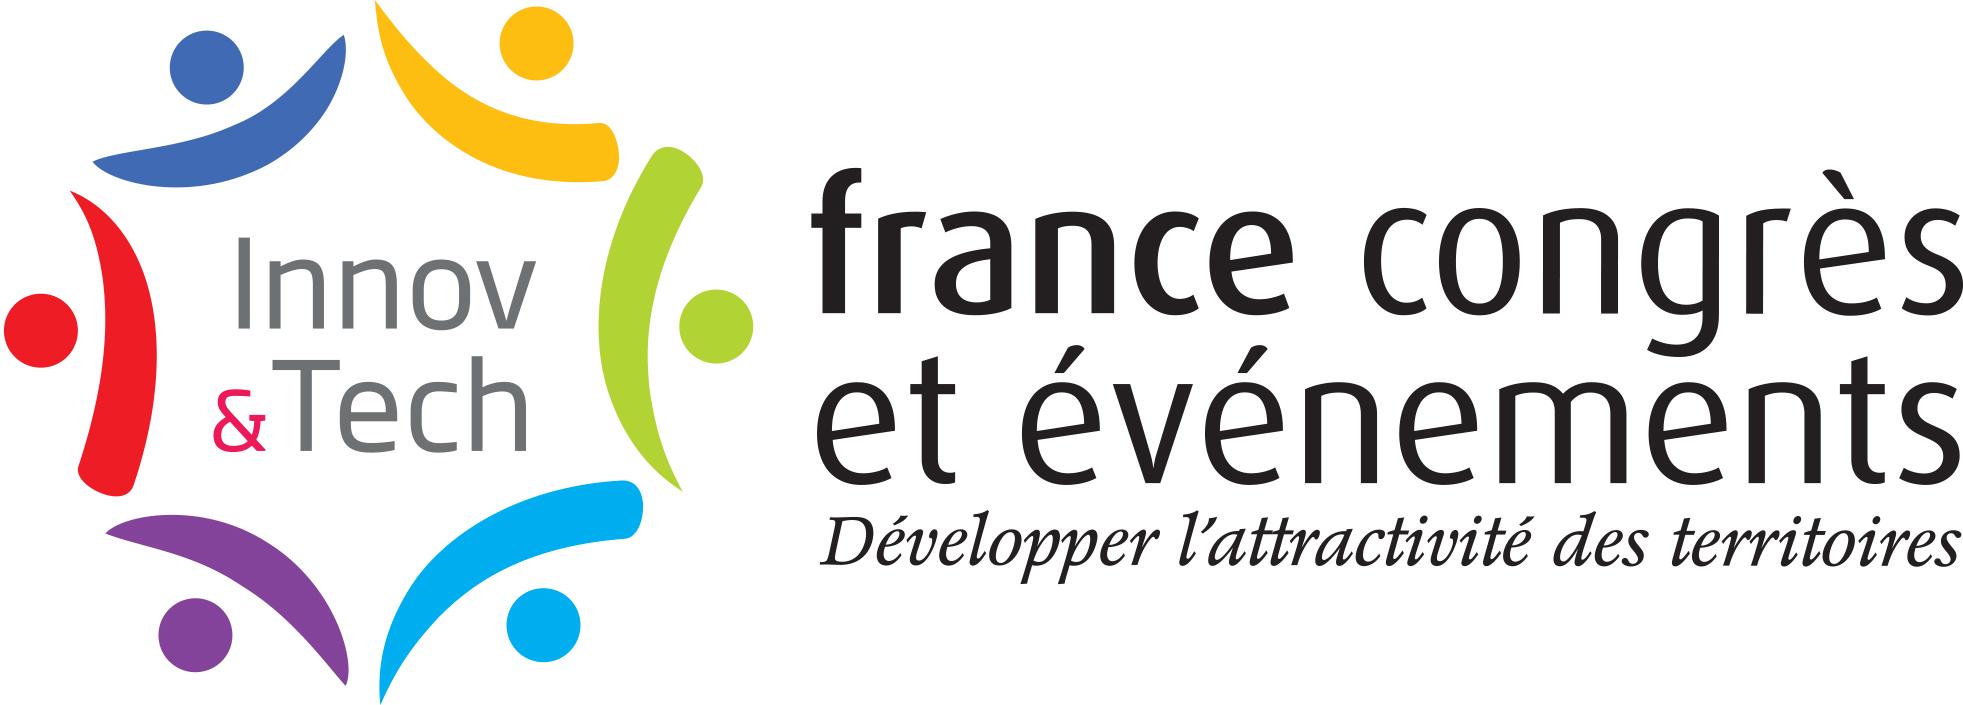 Francecongresnouveaulogo2017cmjnhorizontalinnov14972744781497274478